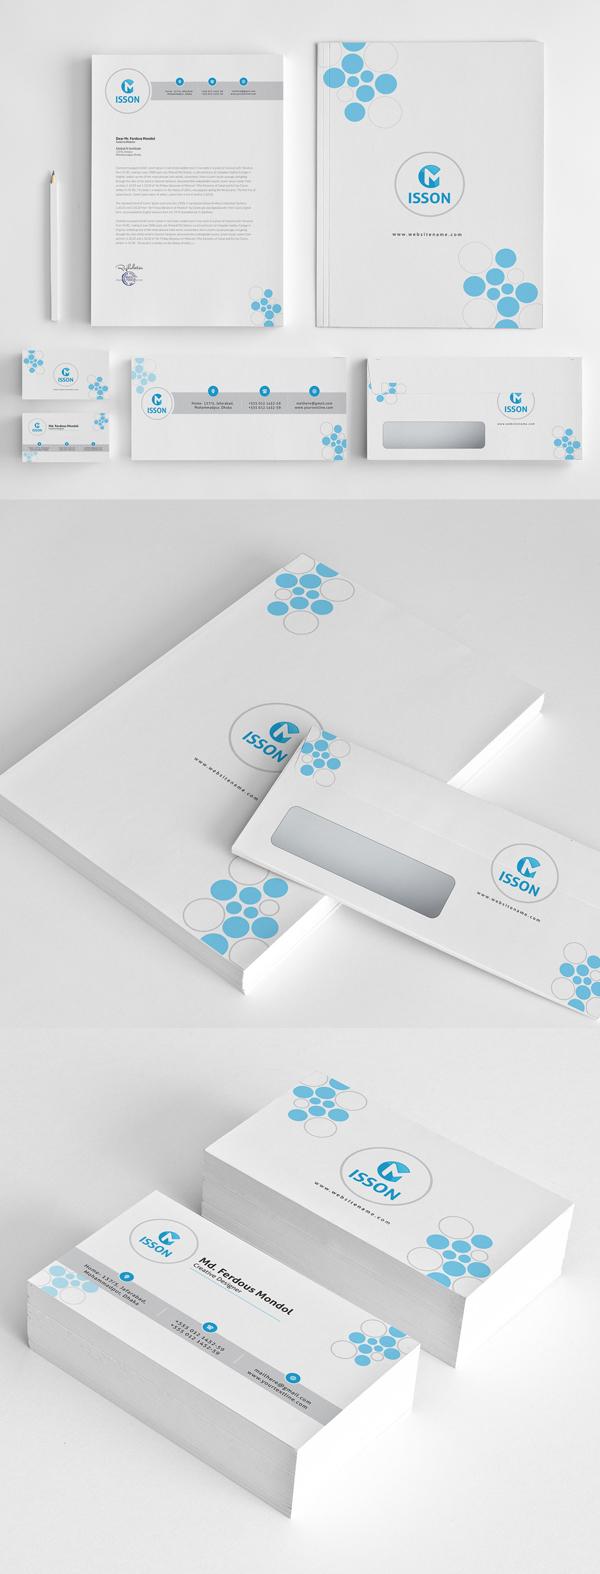 Modern Business Branding / Stationery Templates Design - 9